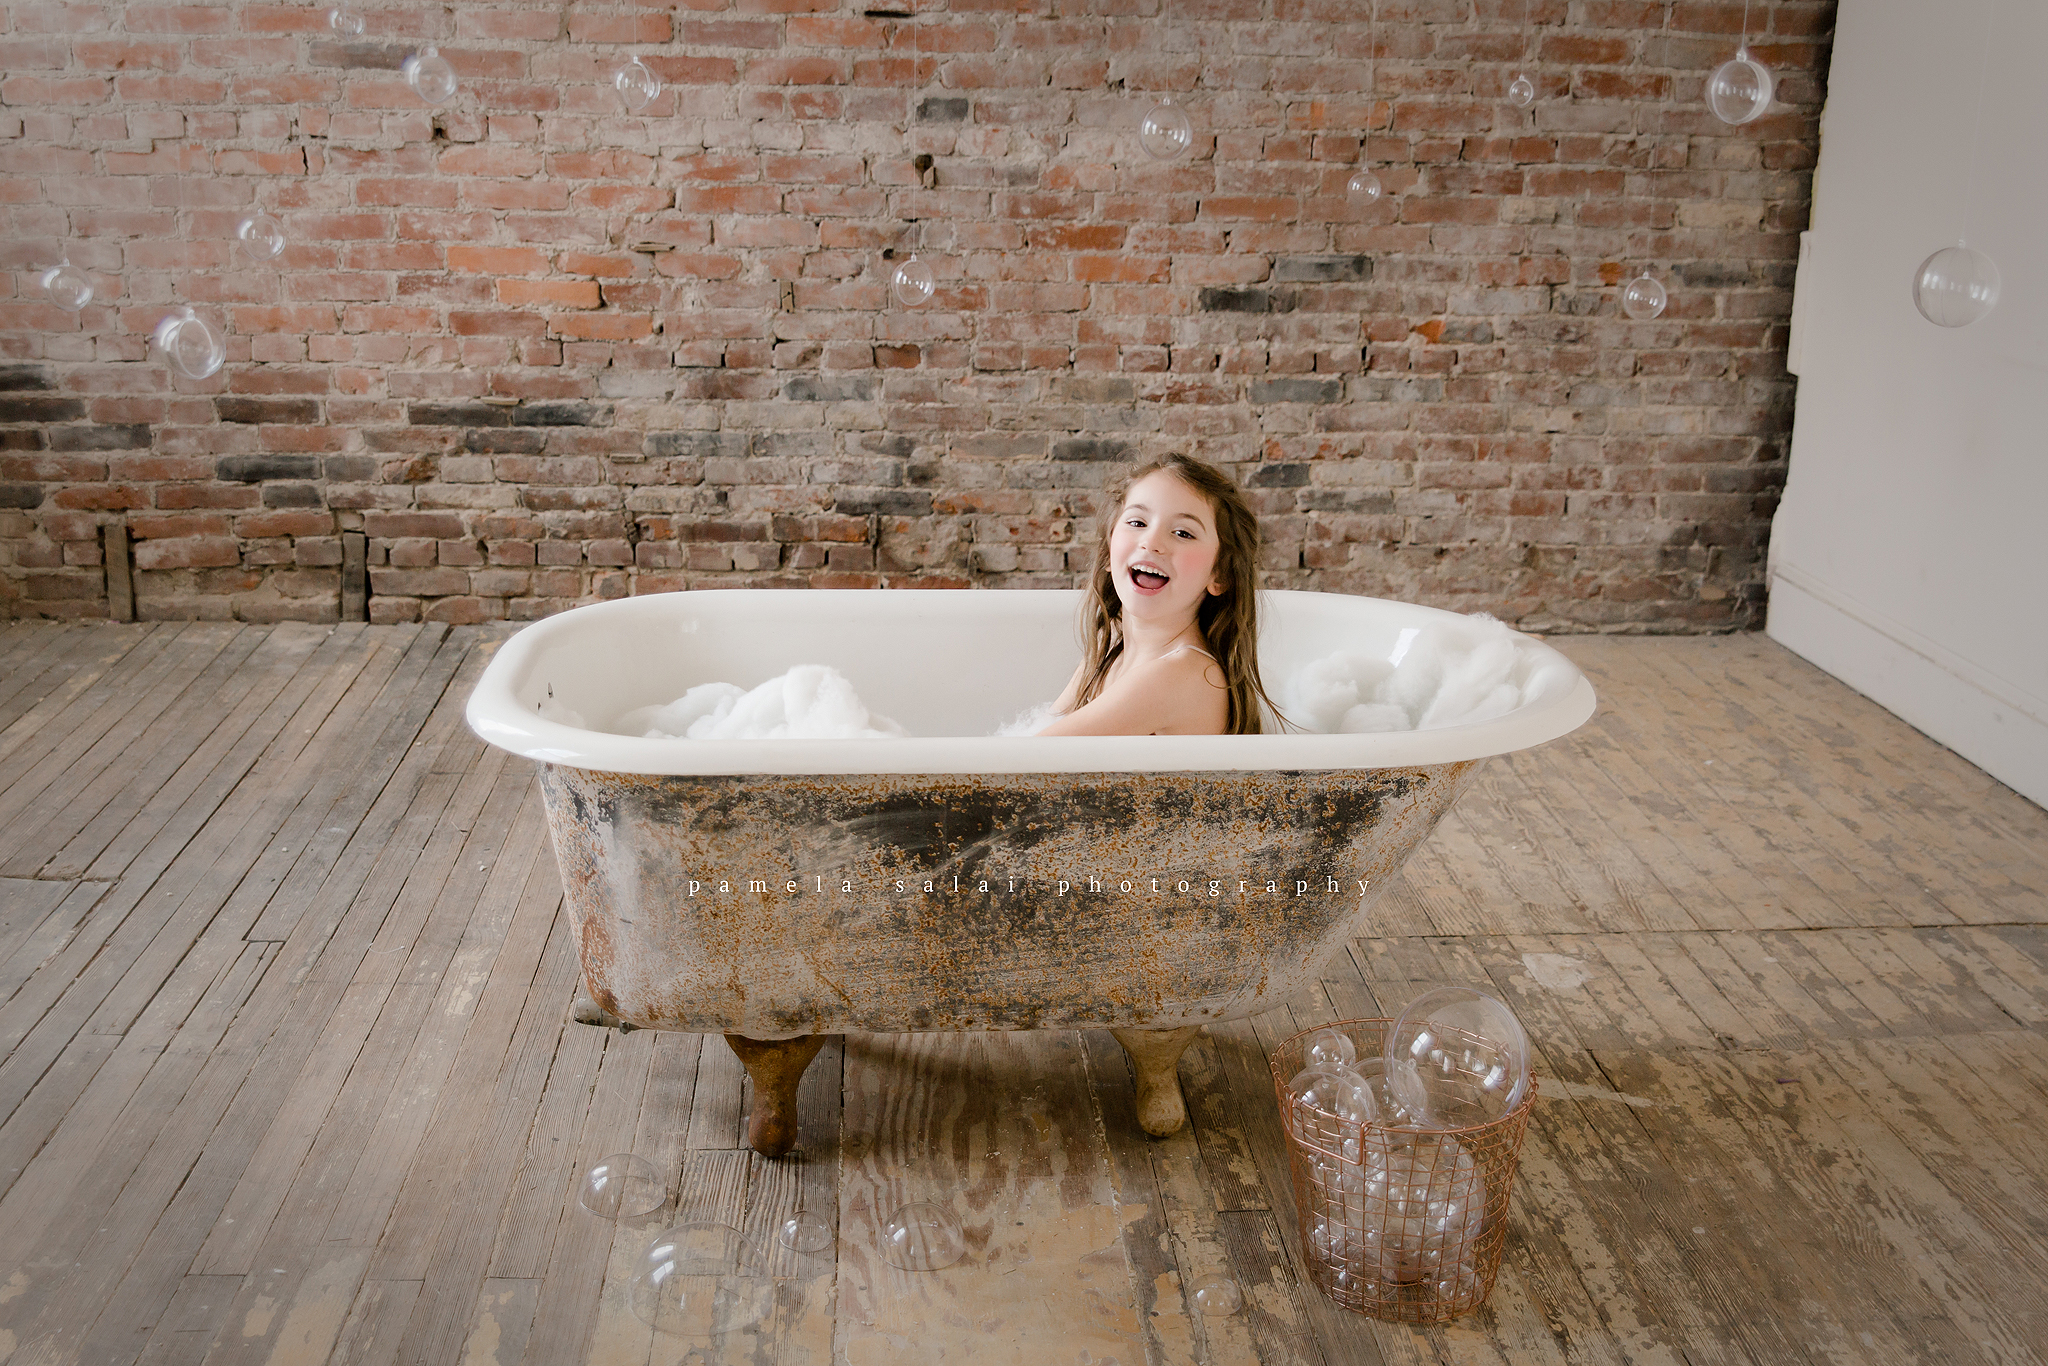 Momazine exposed brick studio pittsburgh Pamela salai photography